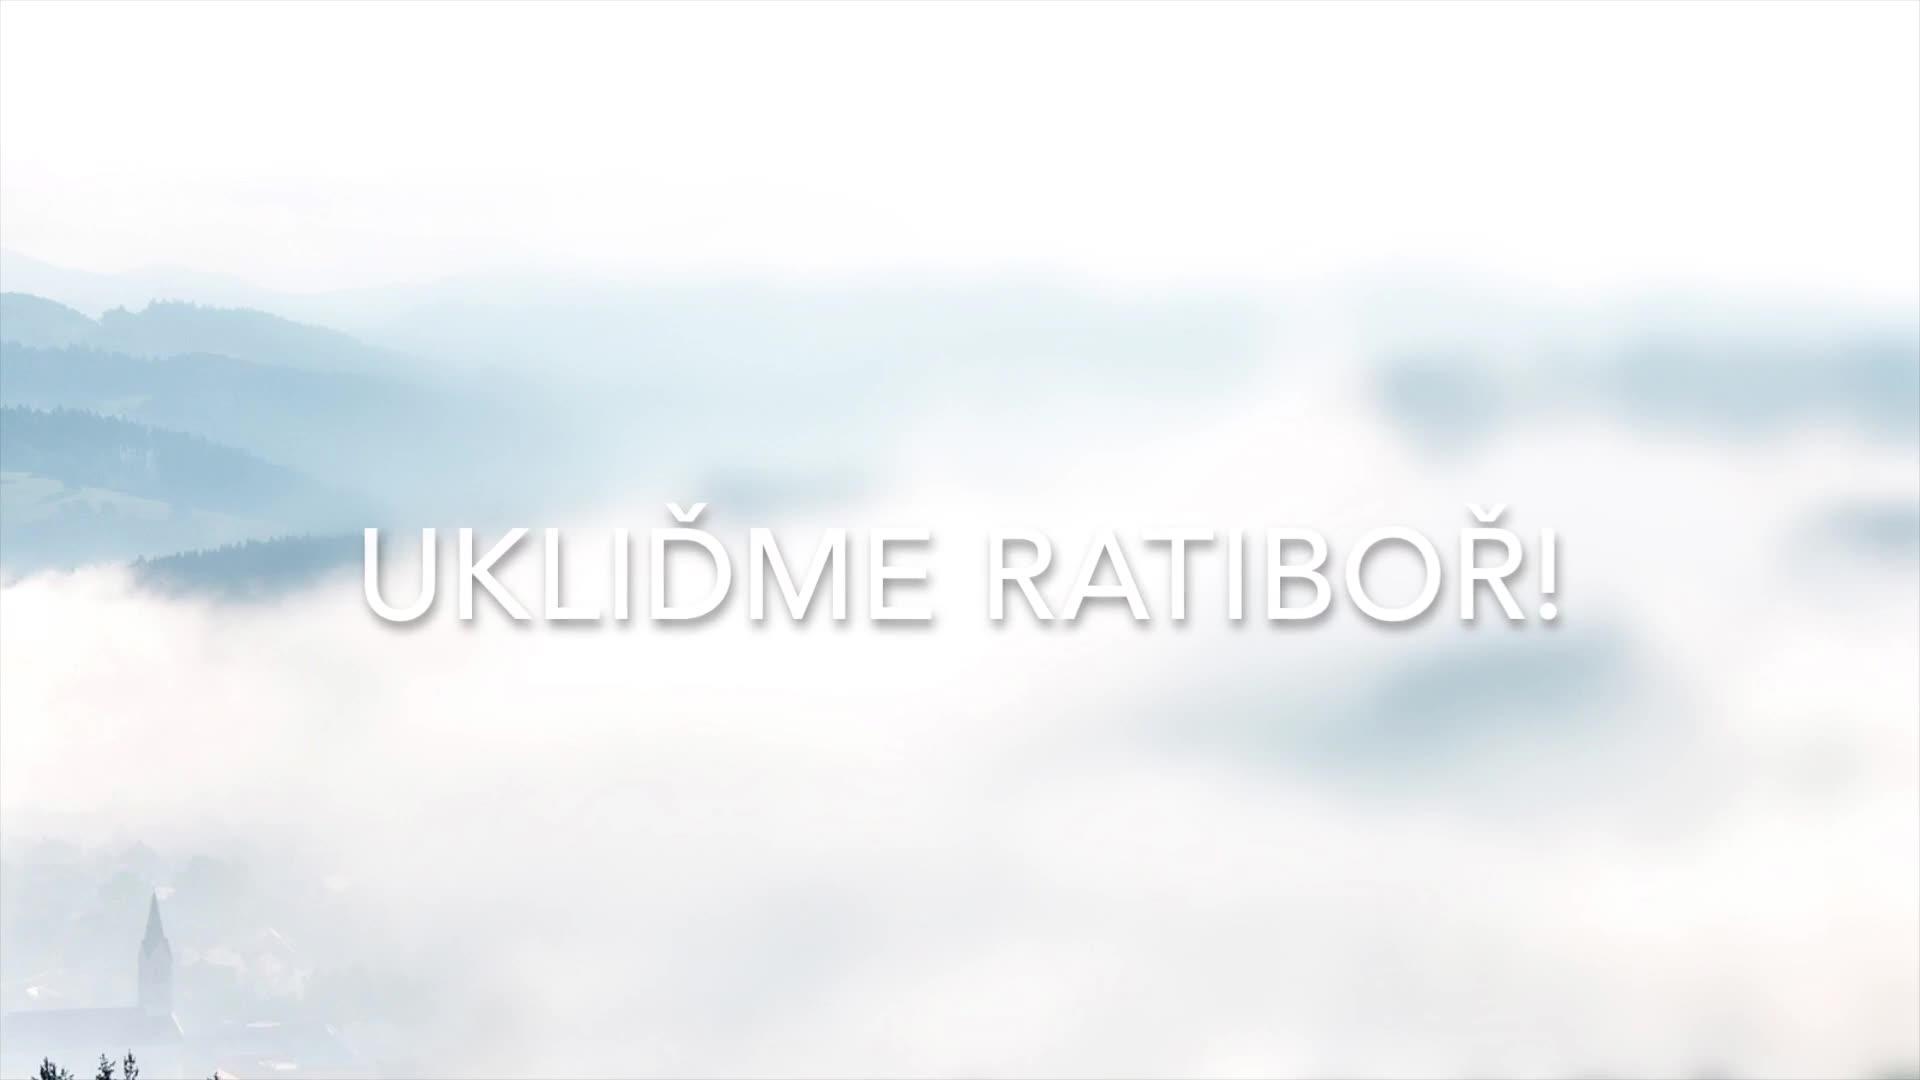 Ukliďme Ratiboř